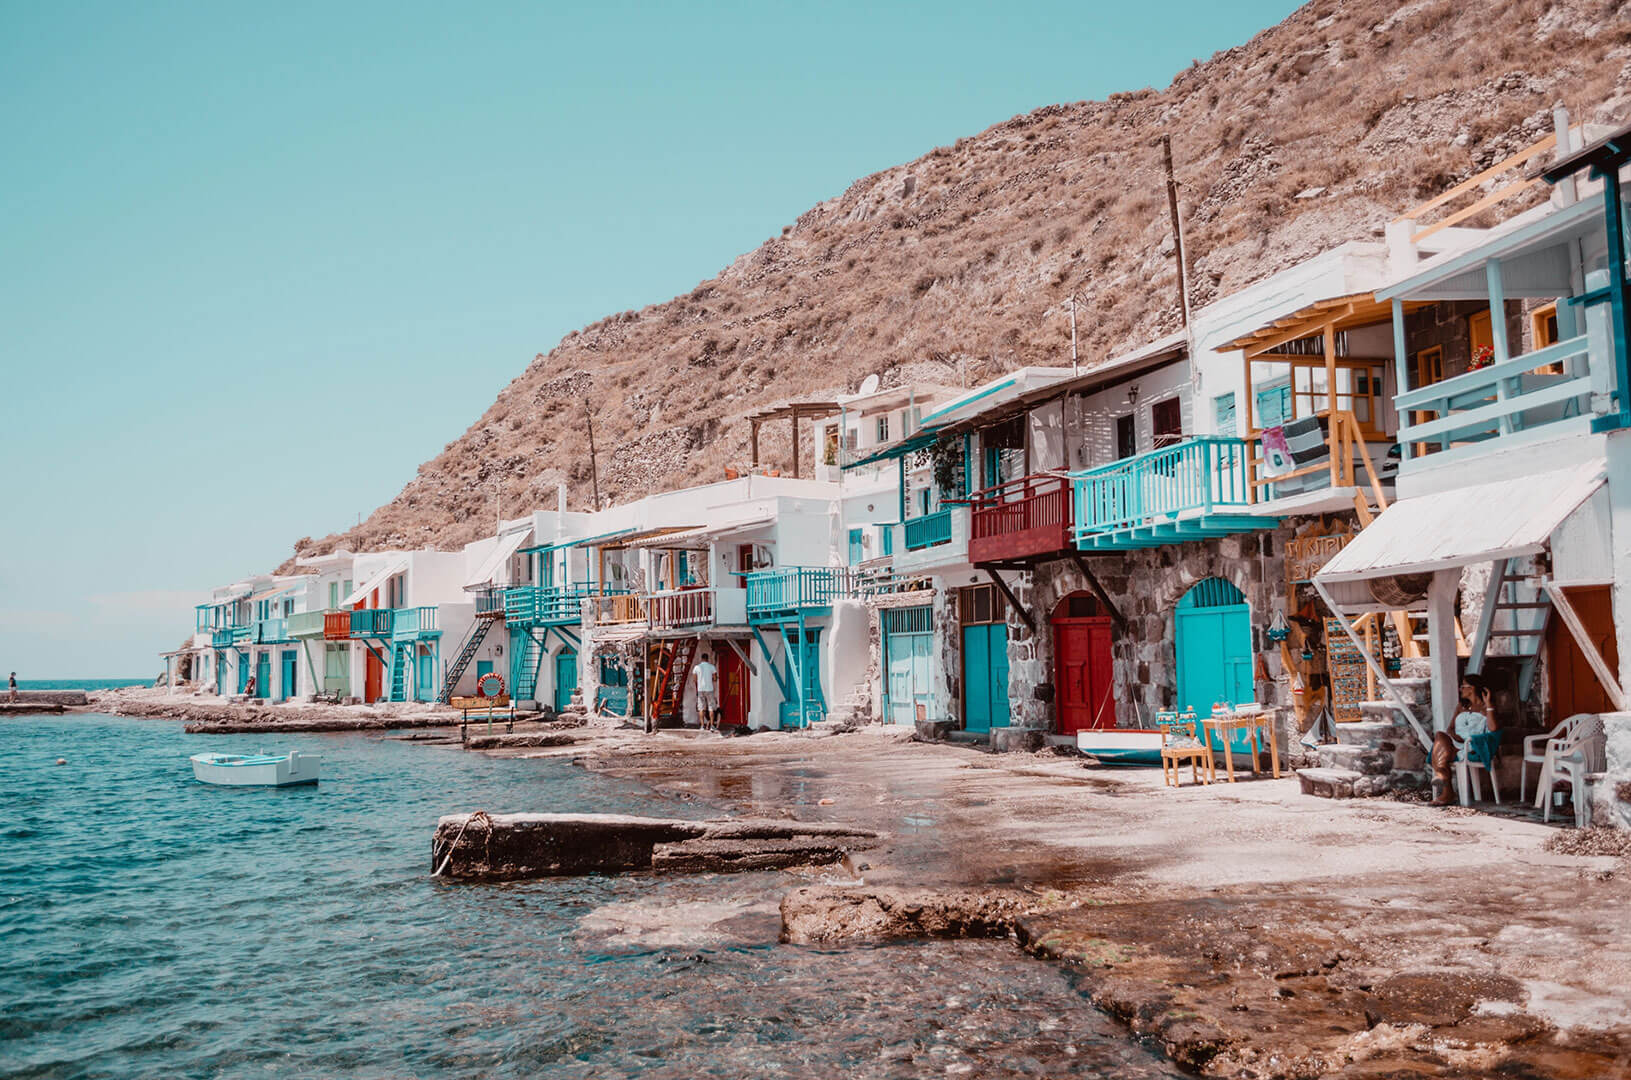 milos-greece-la-vie-en-blog-all-rights-reserved-main